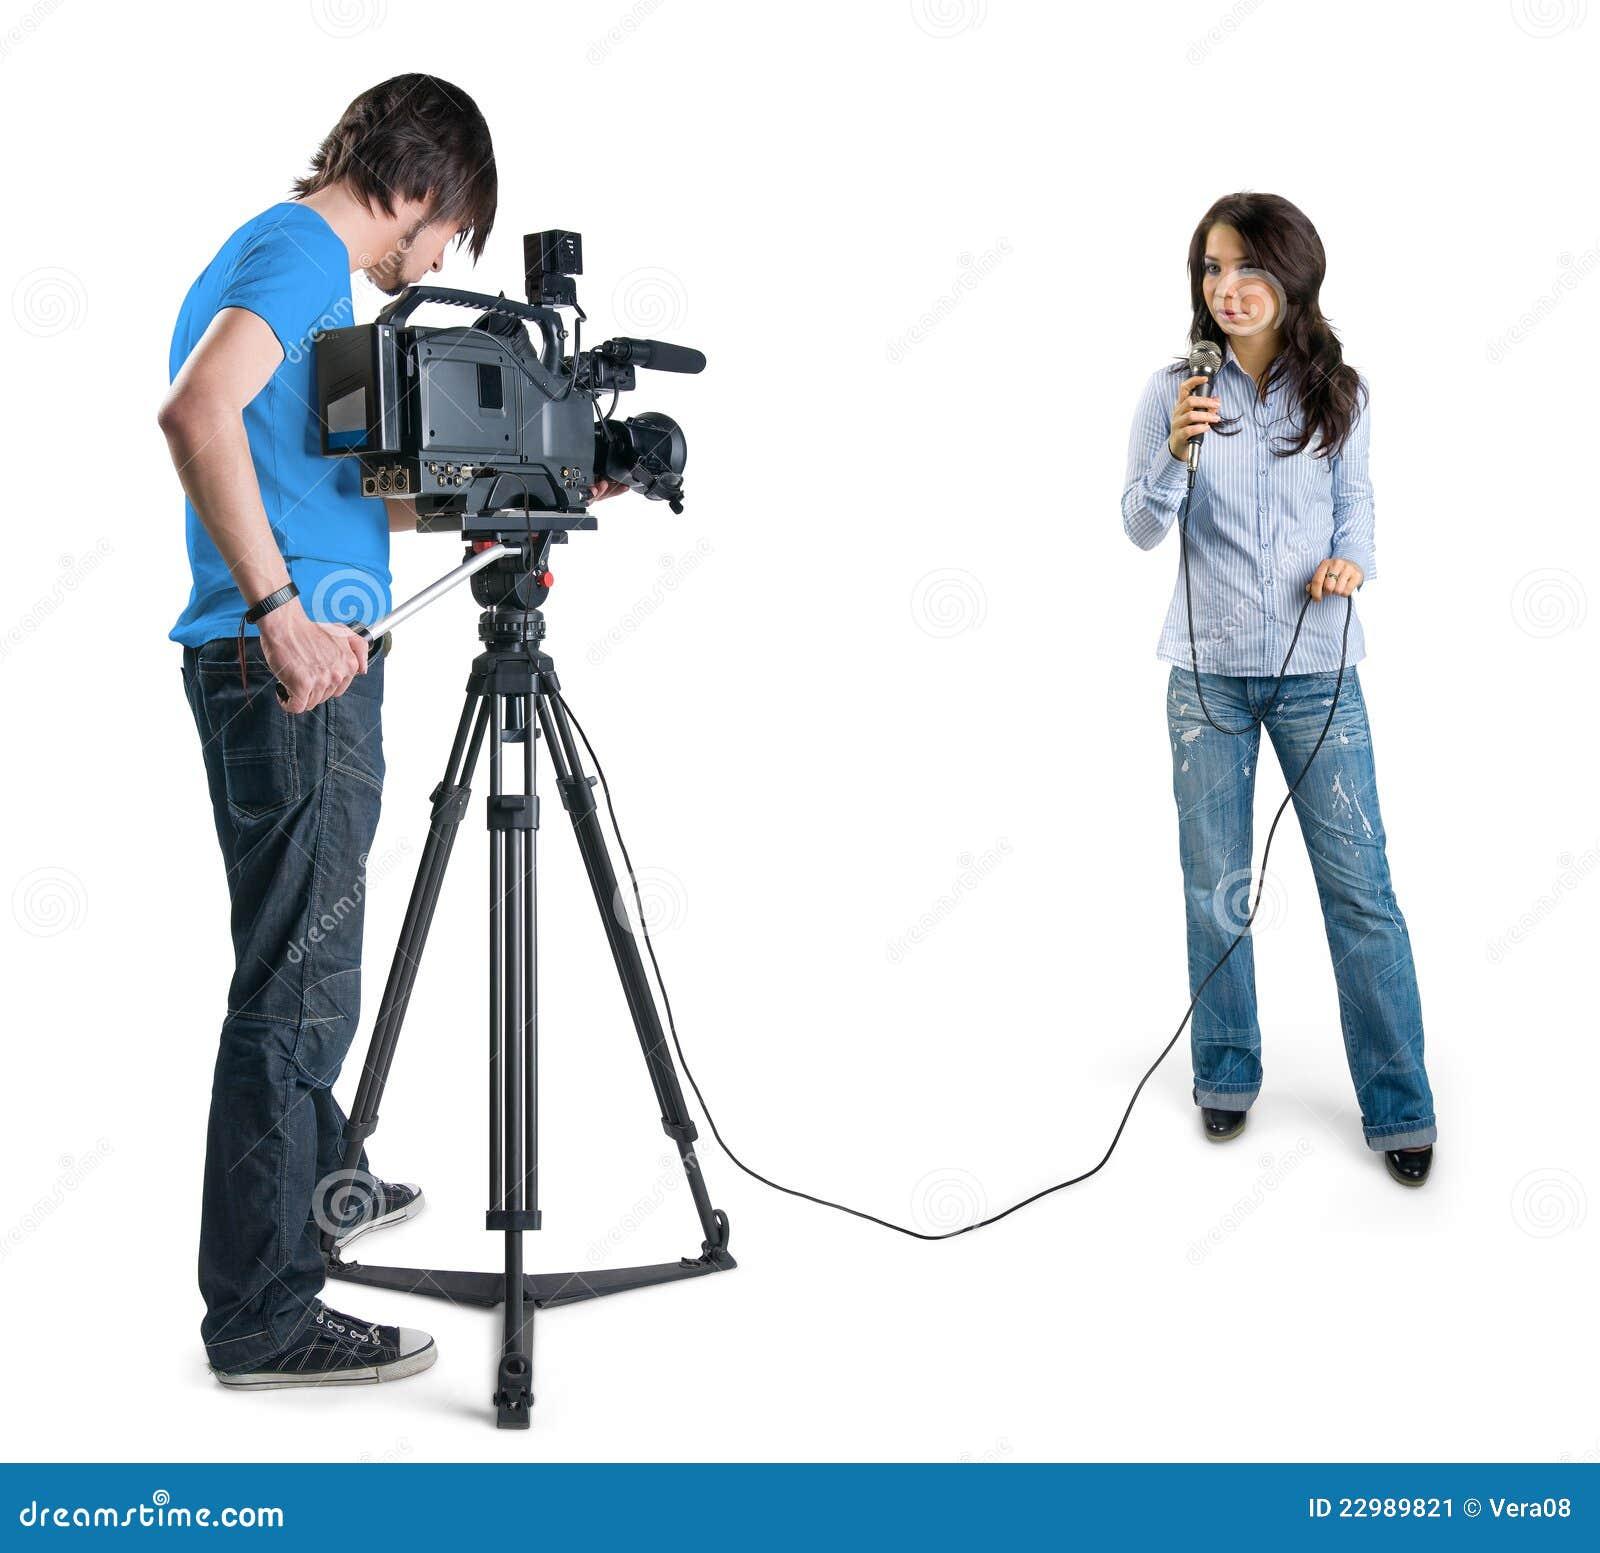 TV reporter presenting the news in studio.